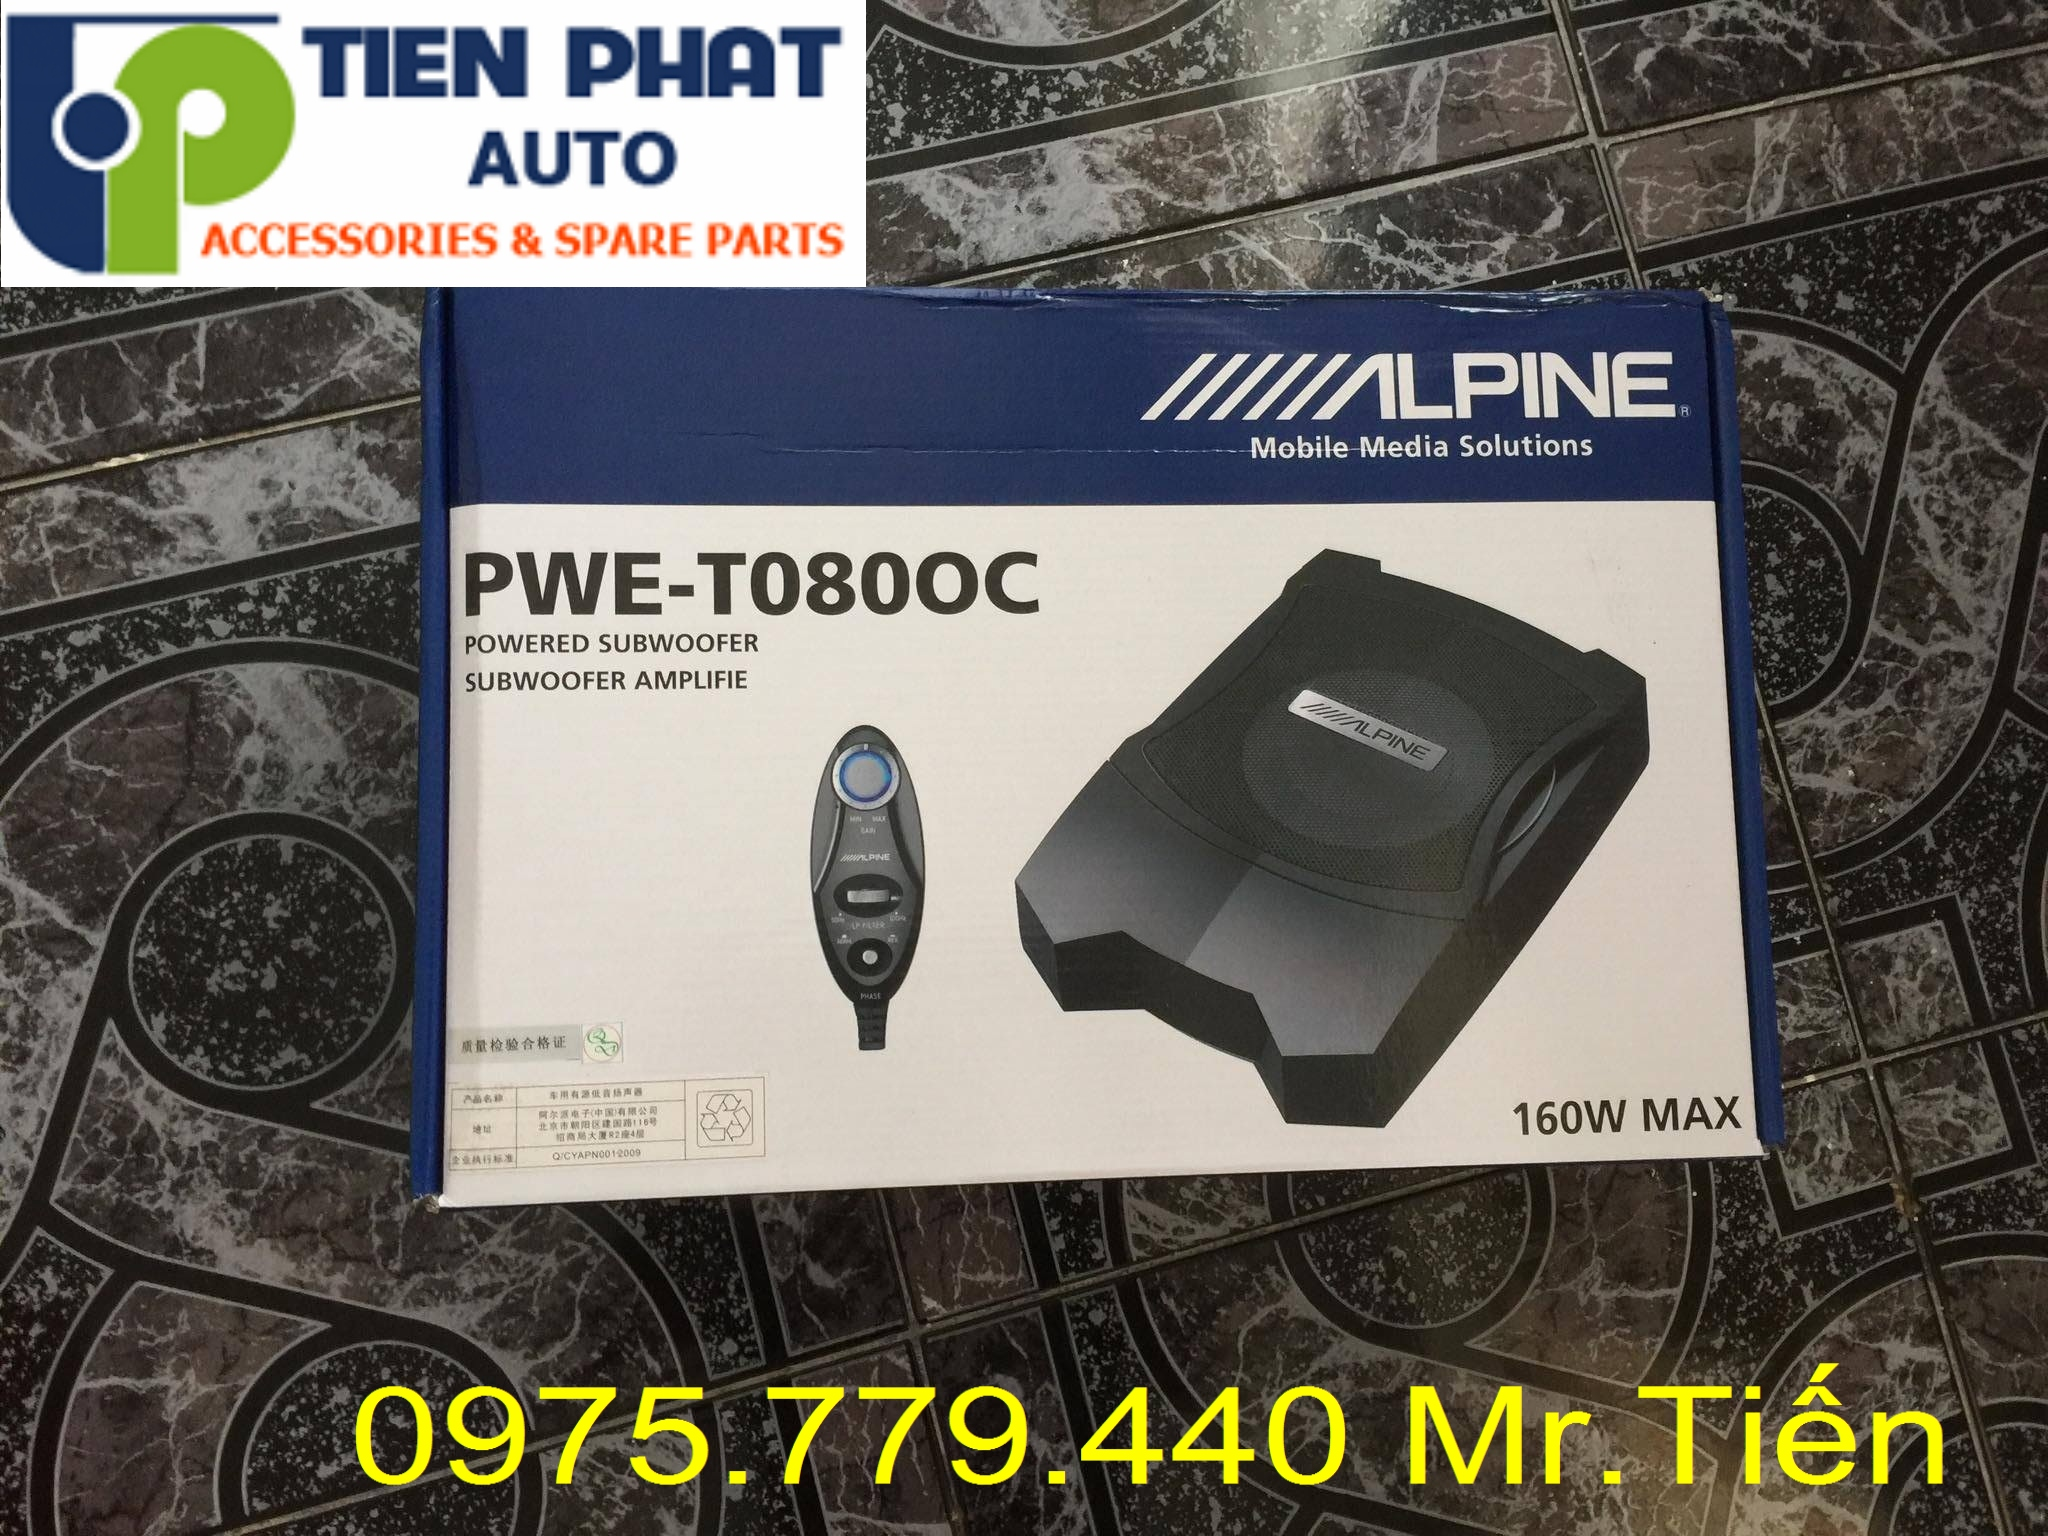 Lắp Loa sub Alpine PWE-T0800C cho Ford Focus Lắp Đặt Tận Nơi